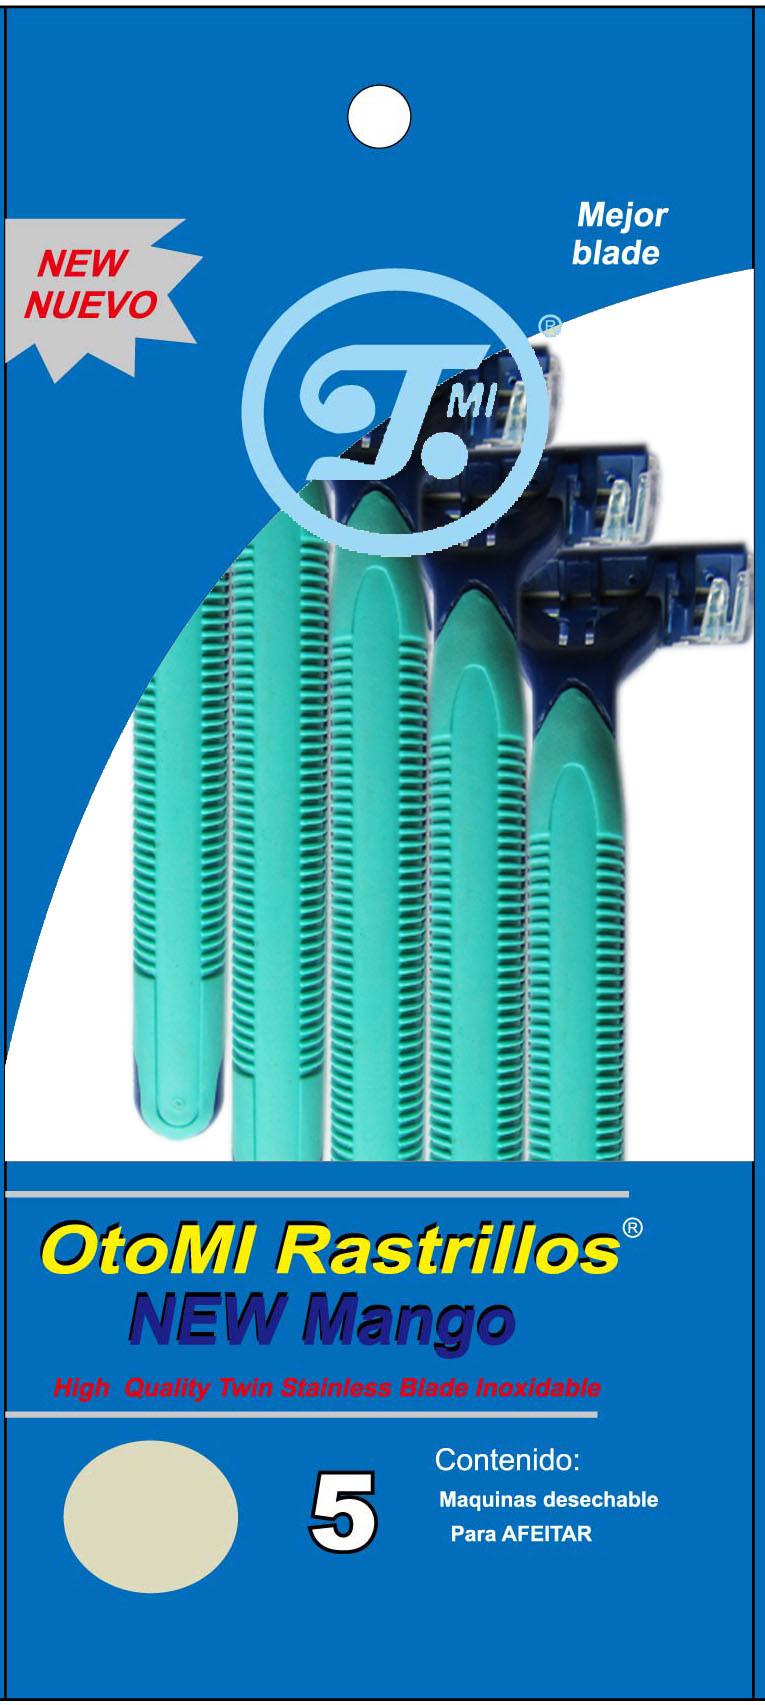 Twin Stainless Steel Razor; Good Quality Disposable Shaving Razor